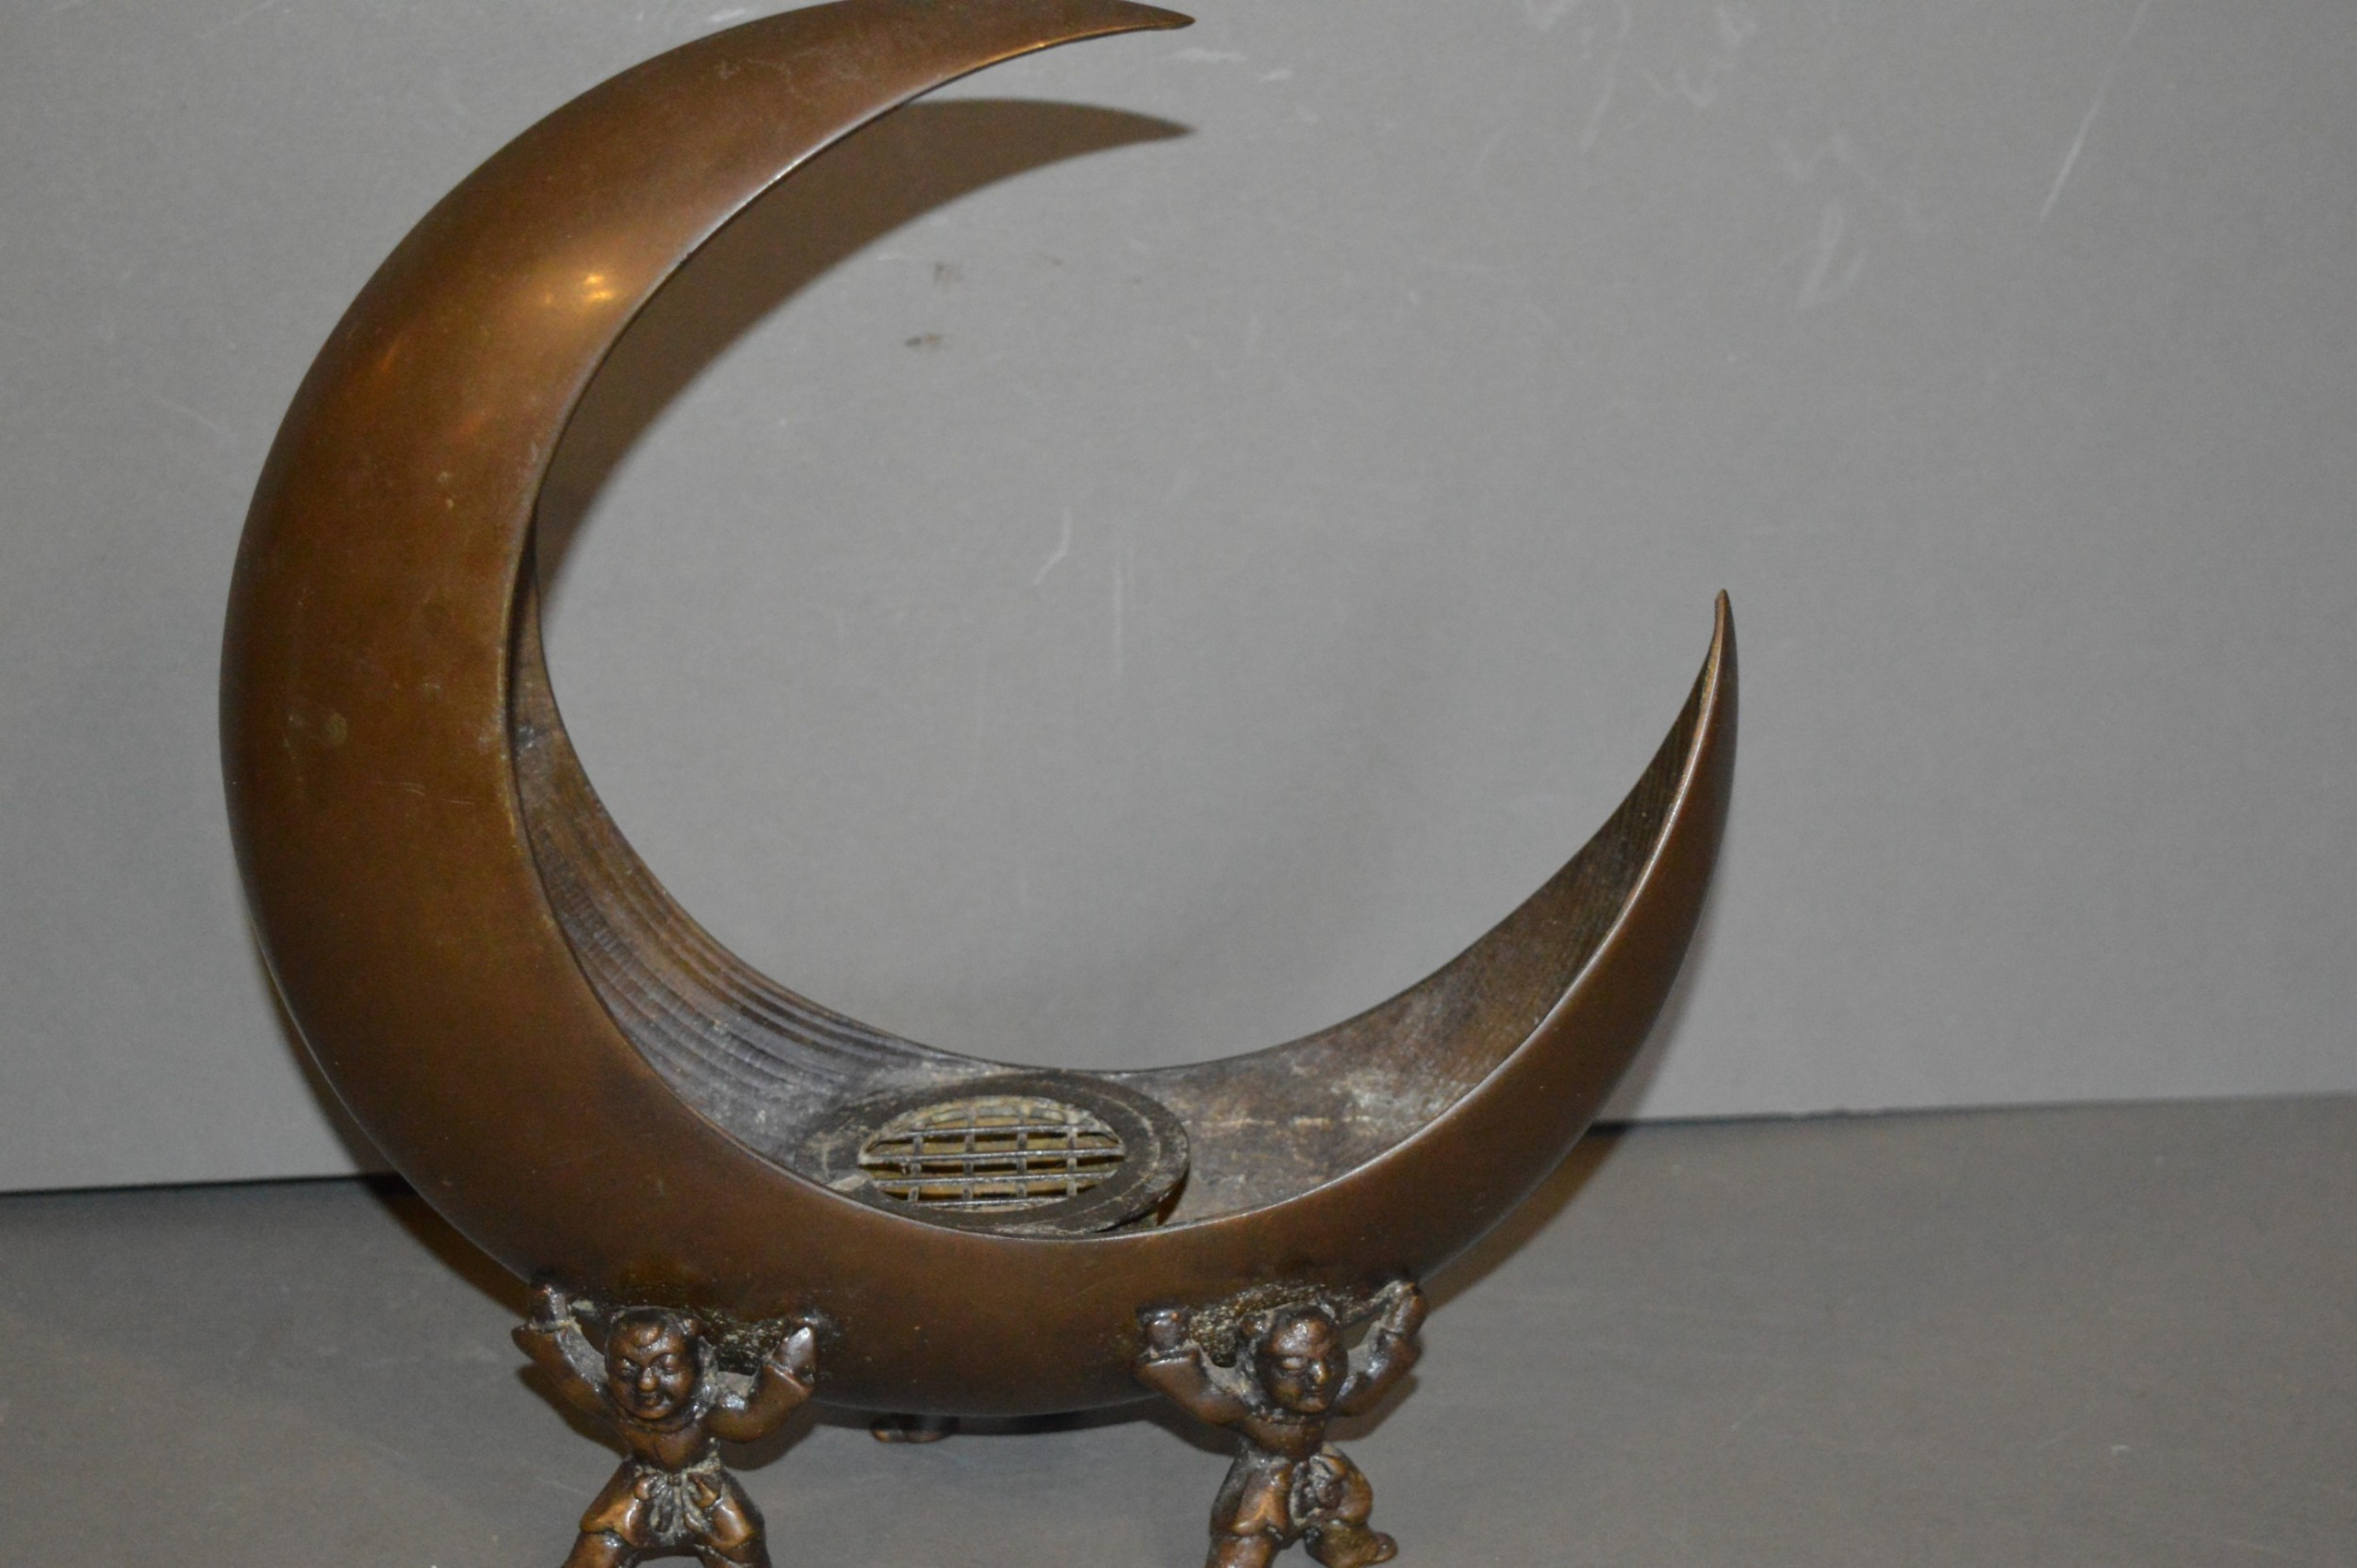 japanese bronze incense burner c 1920 unusual crescent moon shape